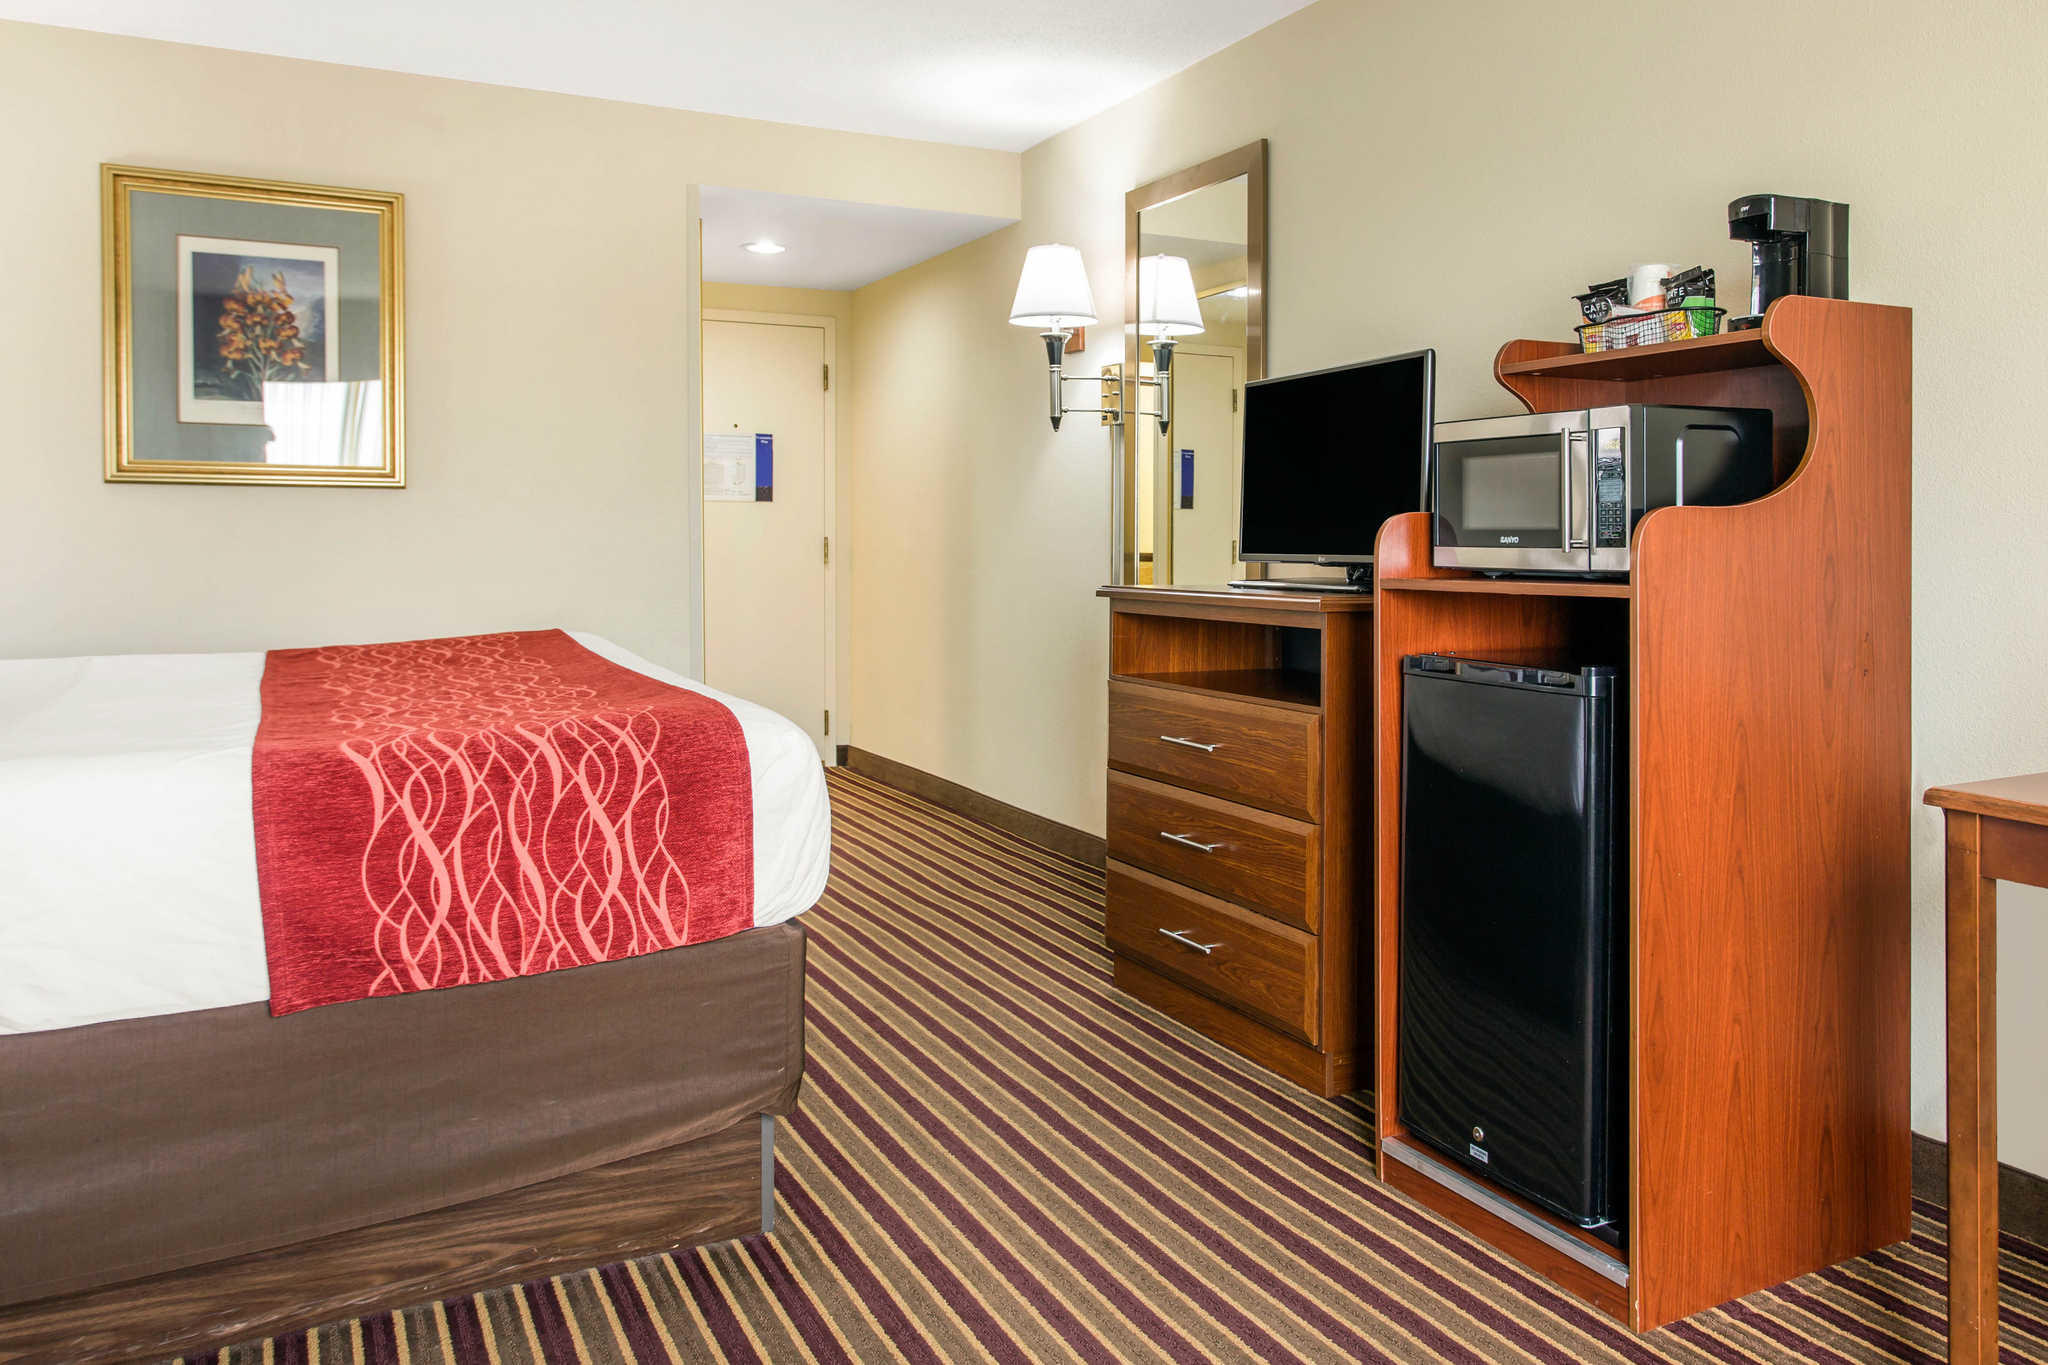 Comfort Inn & Suites Crabtree Valley image 11